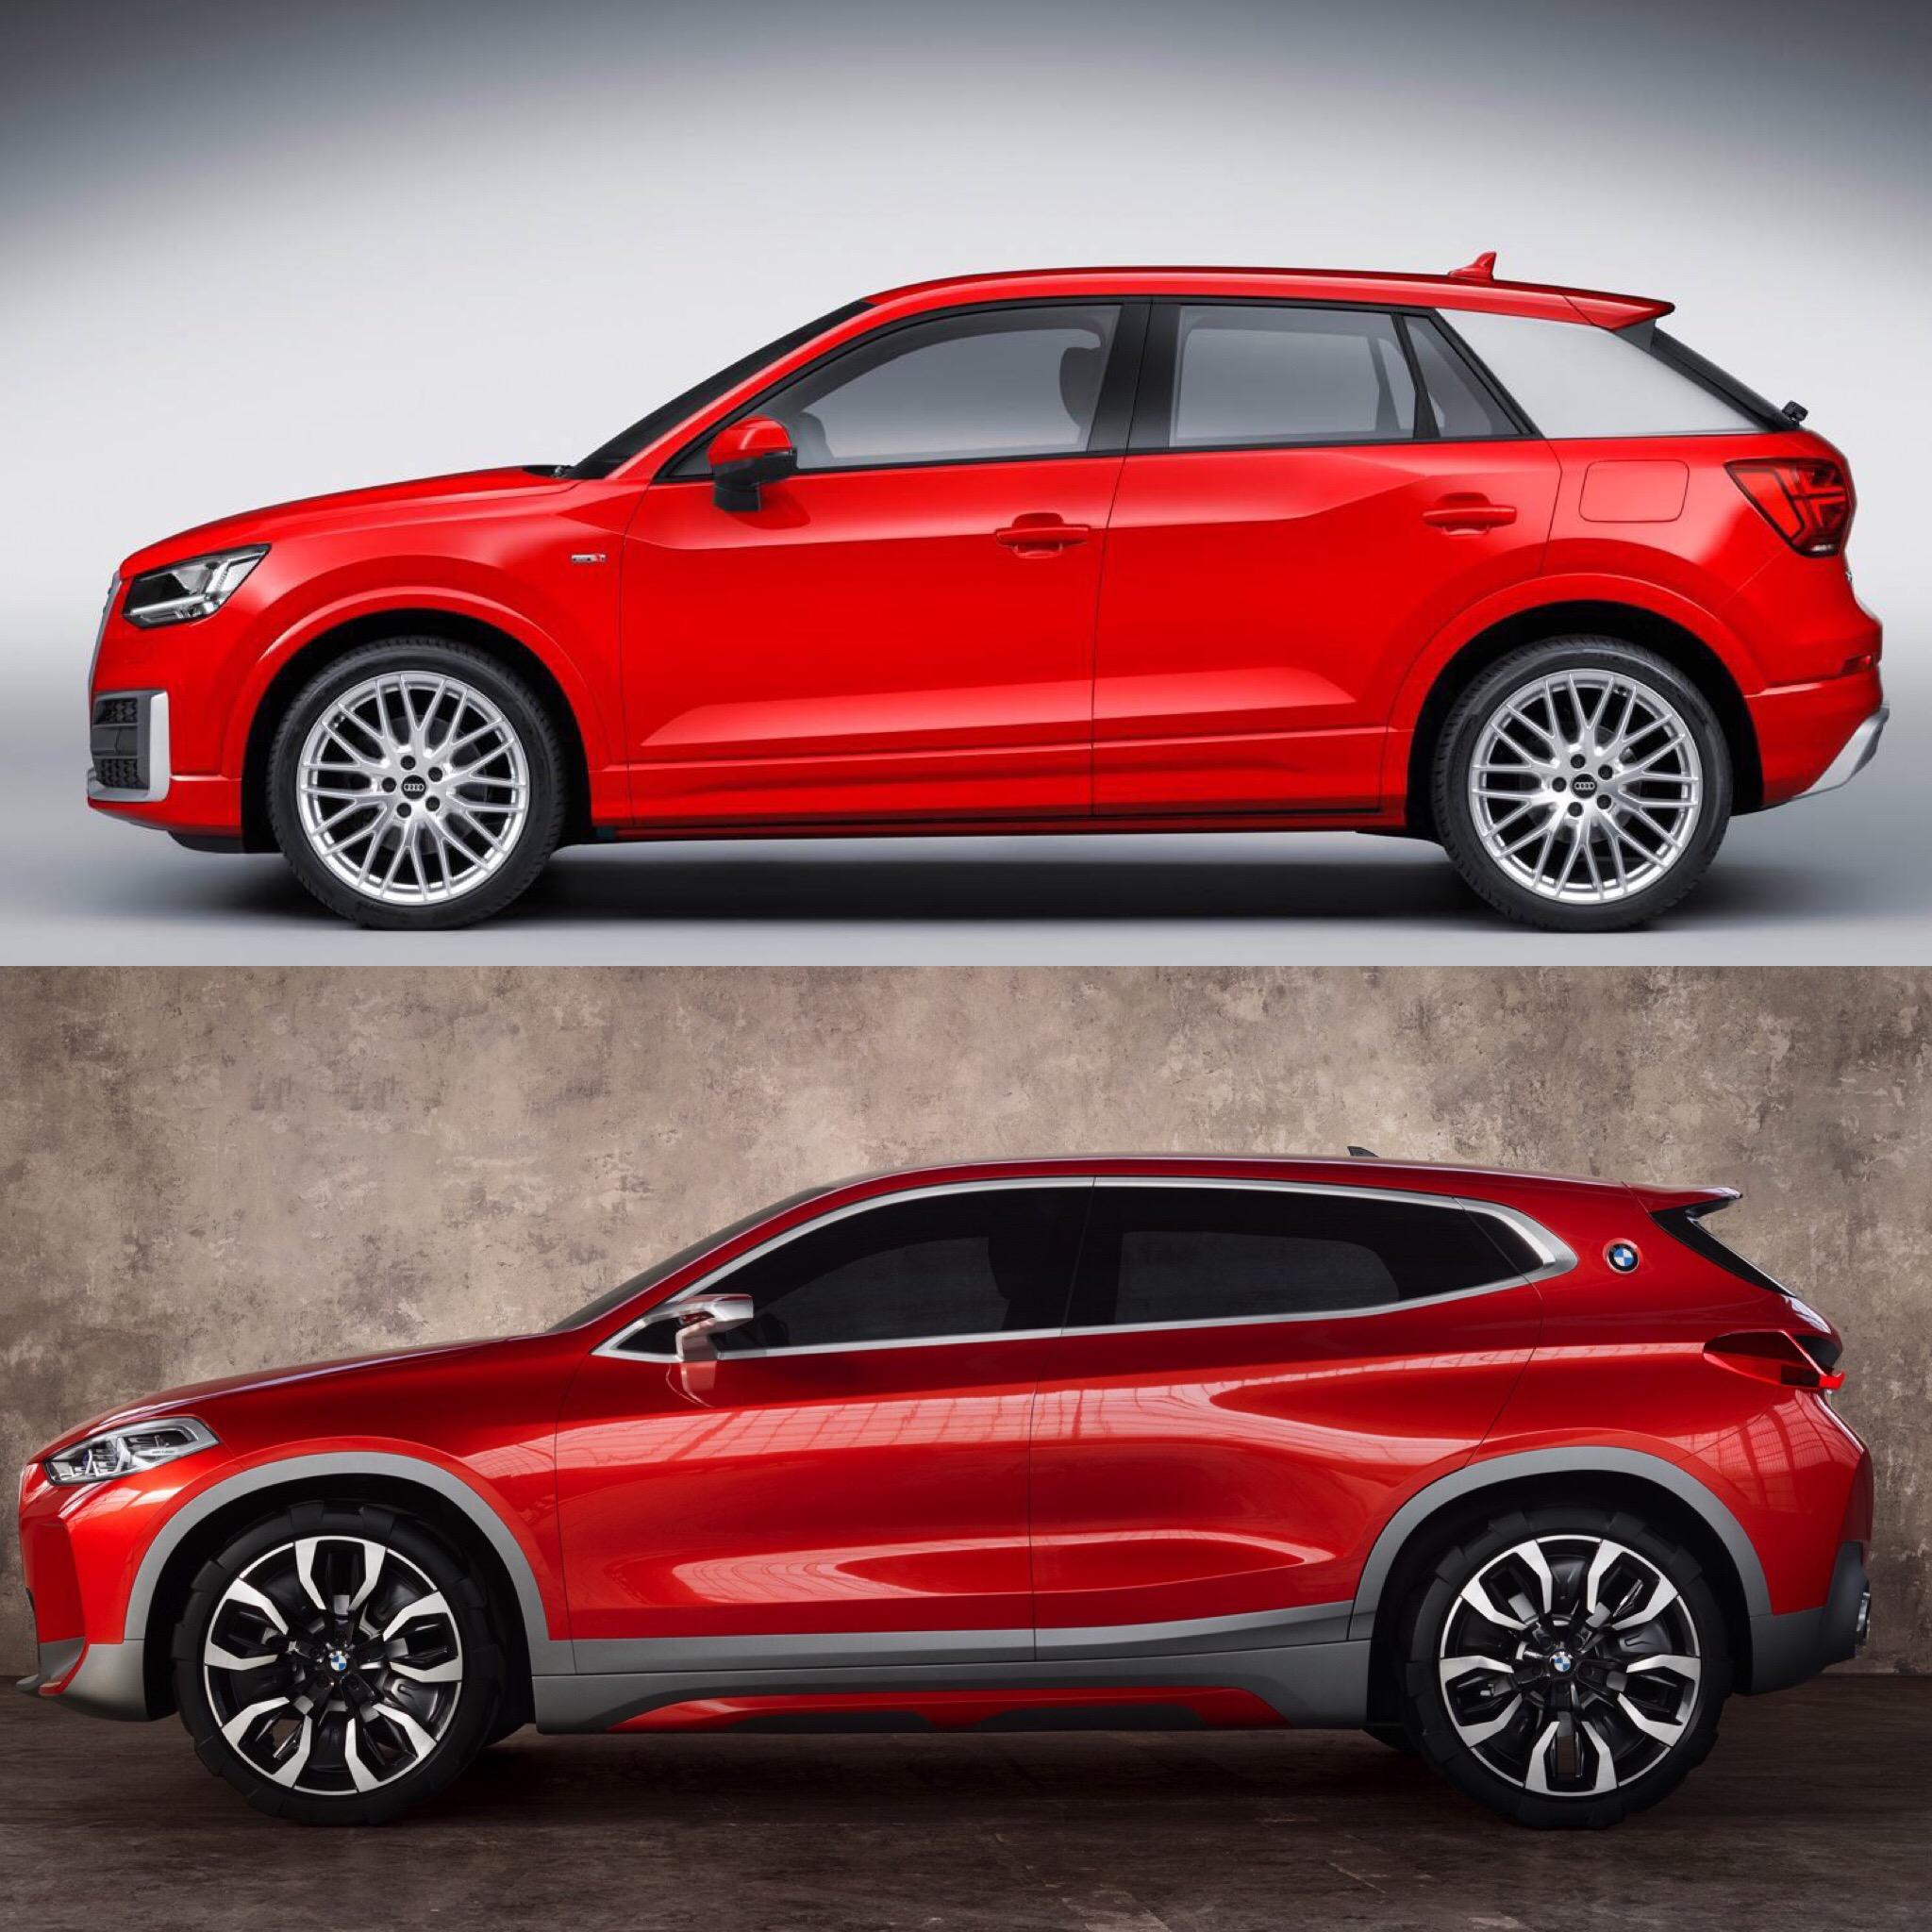 Bmw X1 Vs X2 >> Photo Comparison: BMW X2 vs Audi Q2